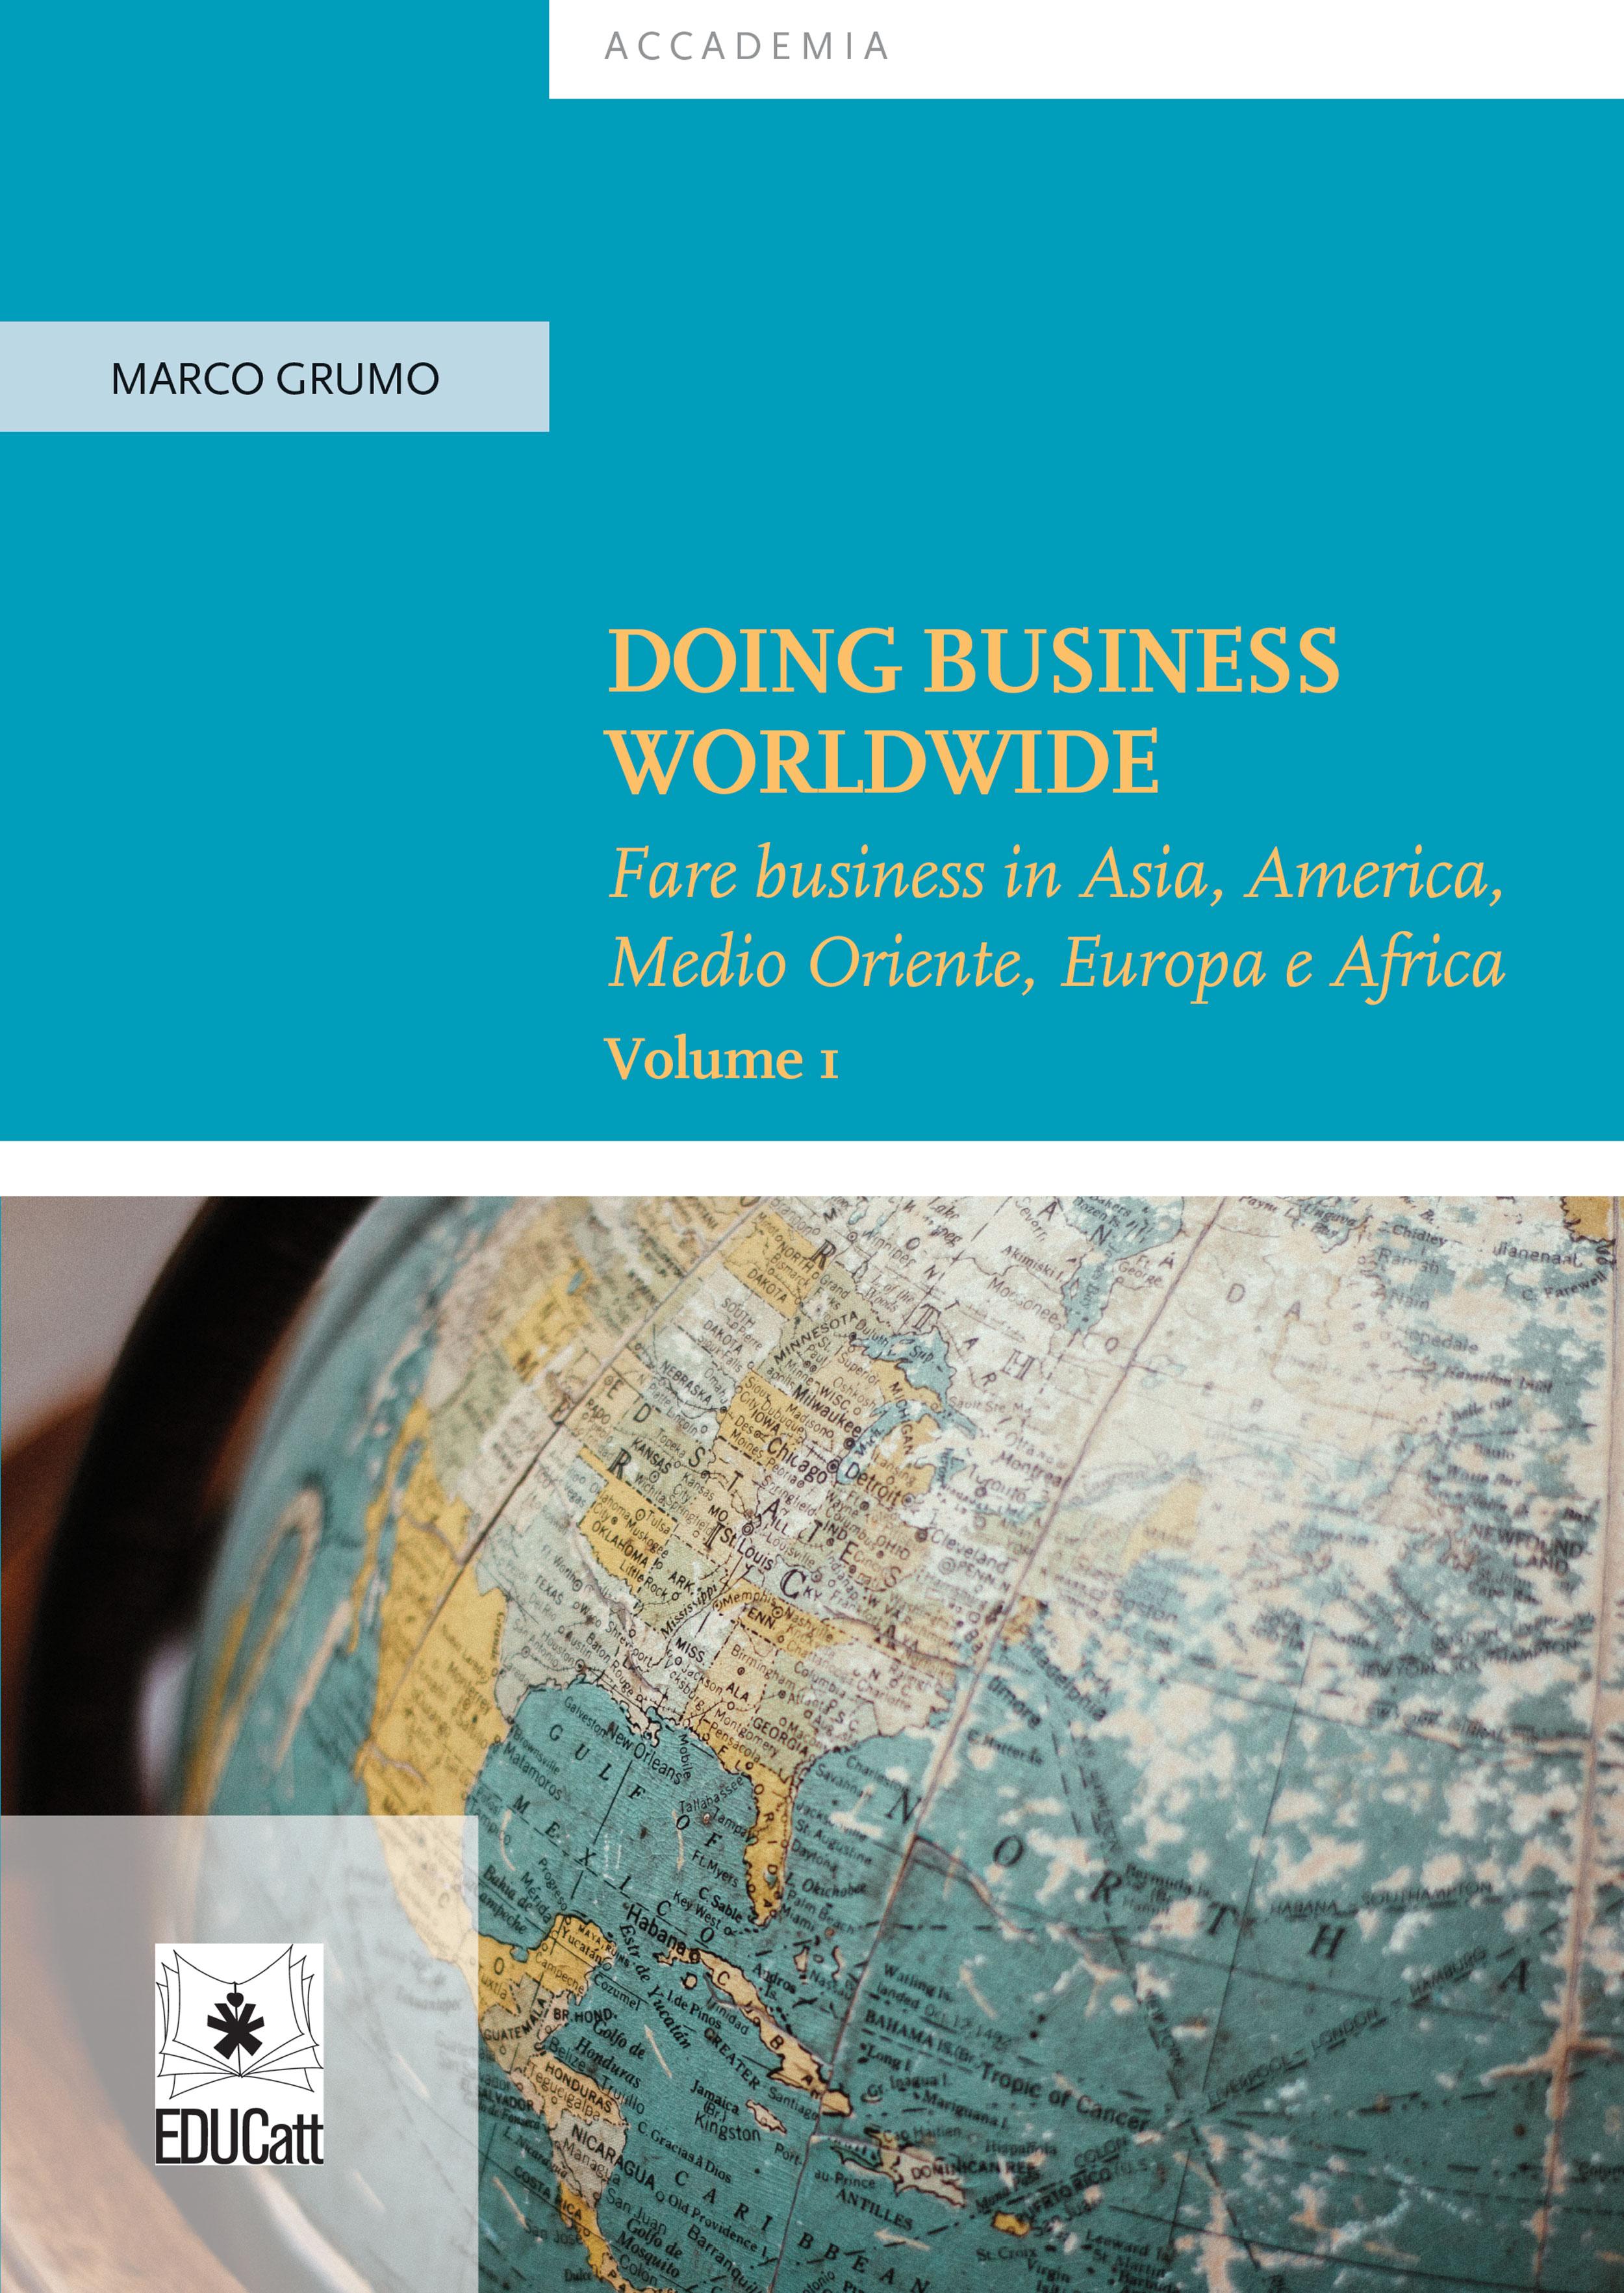 DOING BUSINESS WORLDWIDE VOL. 1 - FARE BUSINESS IN ASIA, AMERICA, MEDIO ORIENTE, EUROPA E AFRICA